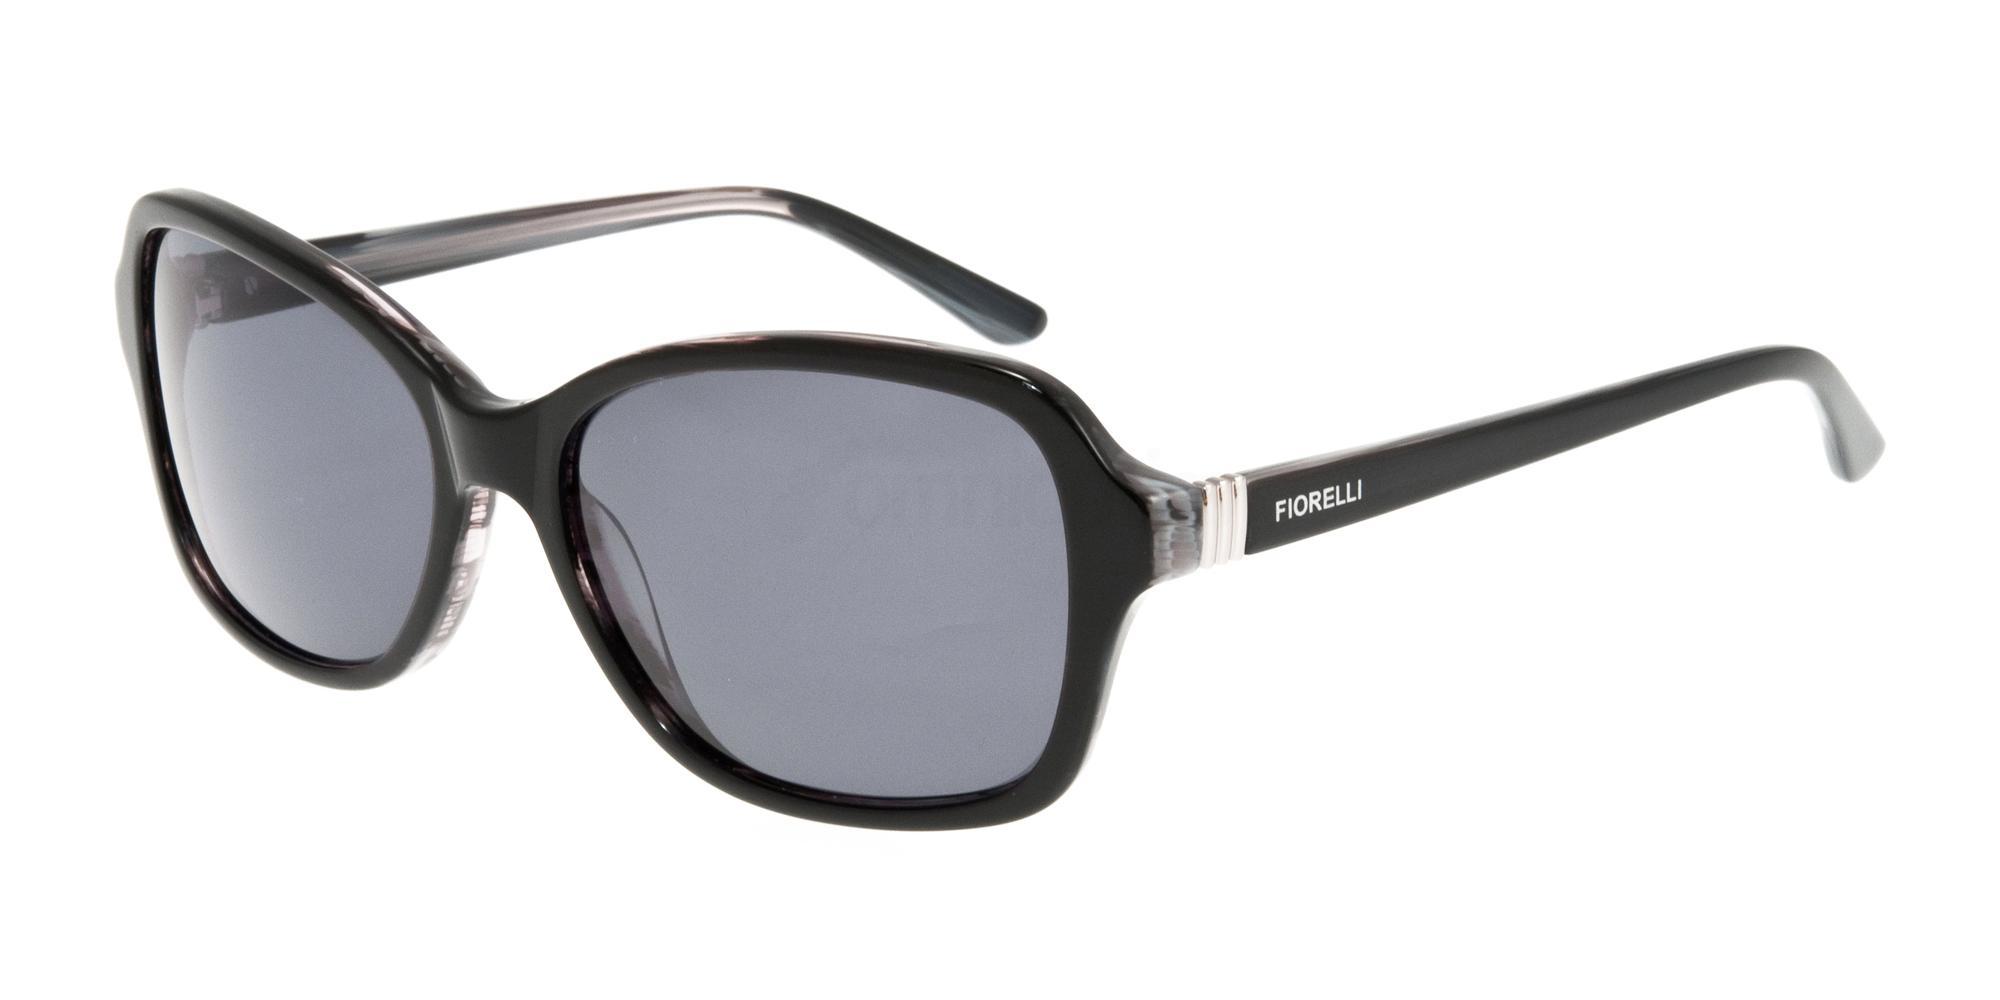 01 FIO053 Sunglasses, Fiorelli